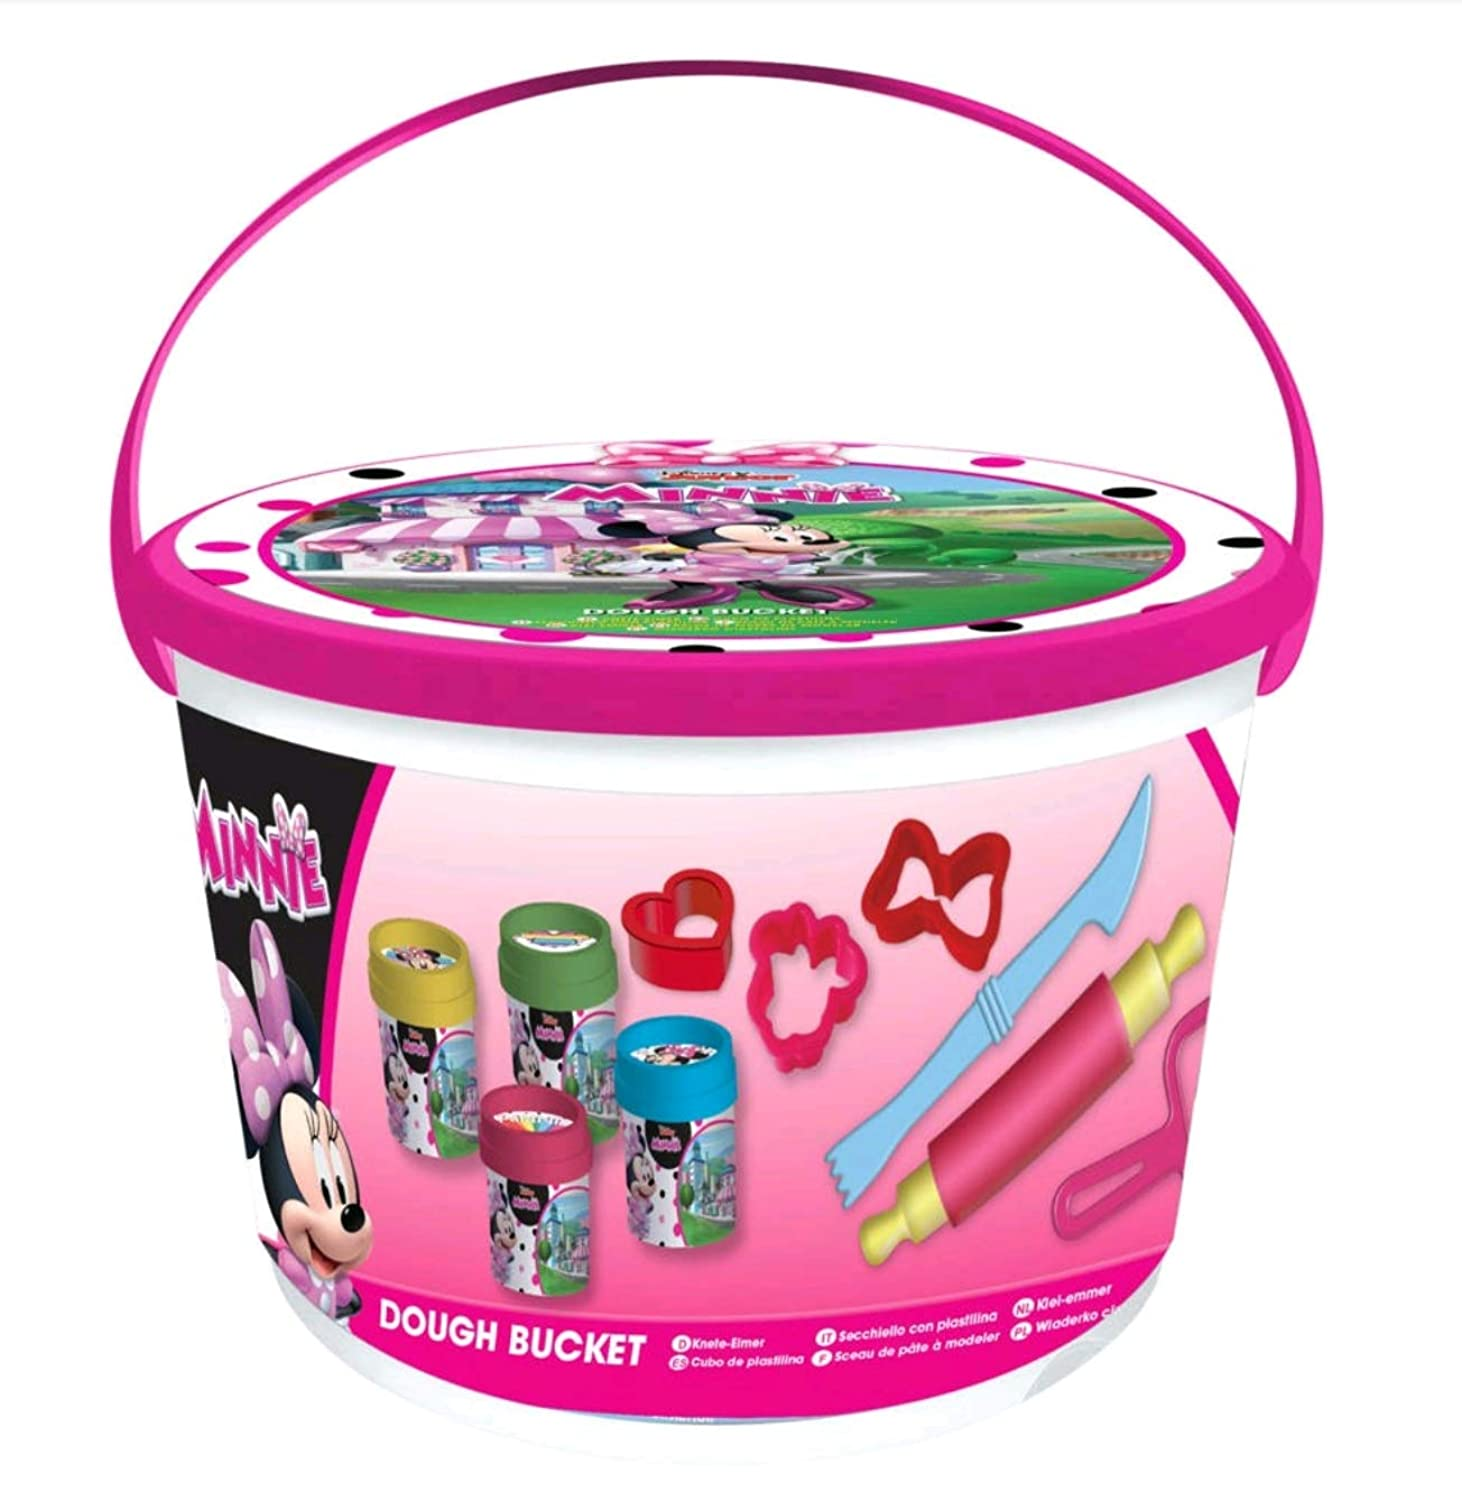 Sambro Disney CUBO PLASTILINA Deluxe DE Minnie Mouse Fun Filled Dough Bucket Perfect Birthday,, Arts and Crafts for Kids, Multicolour